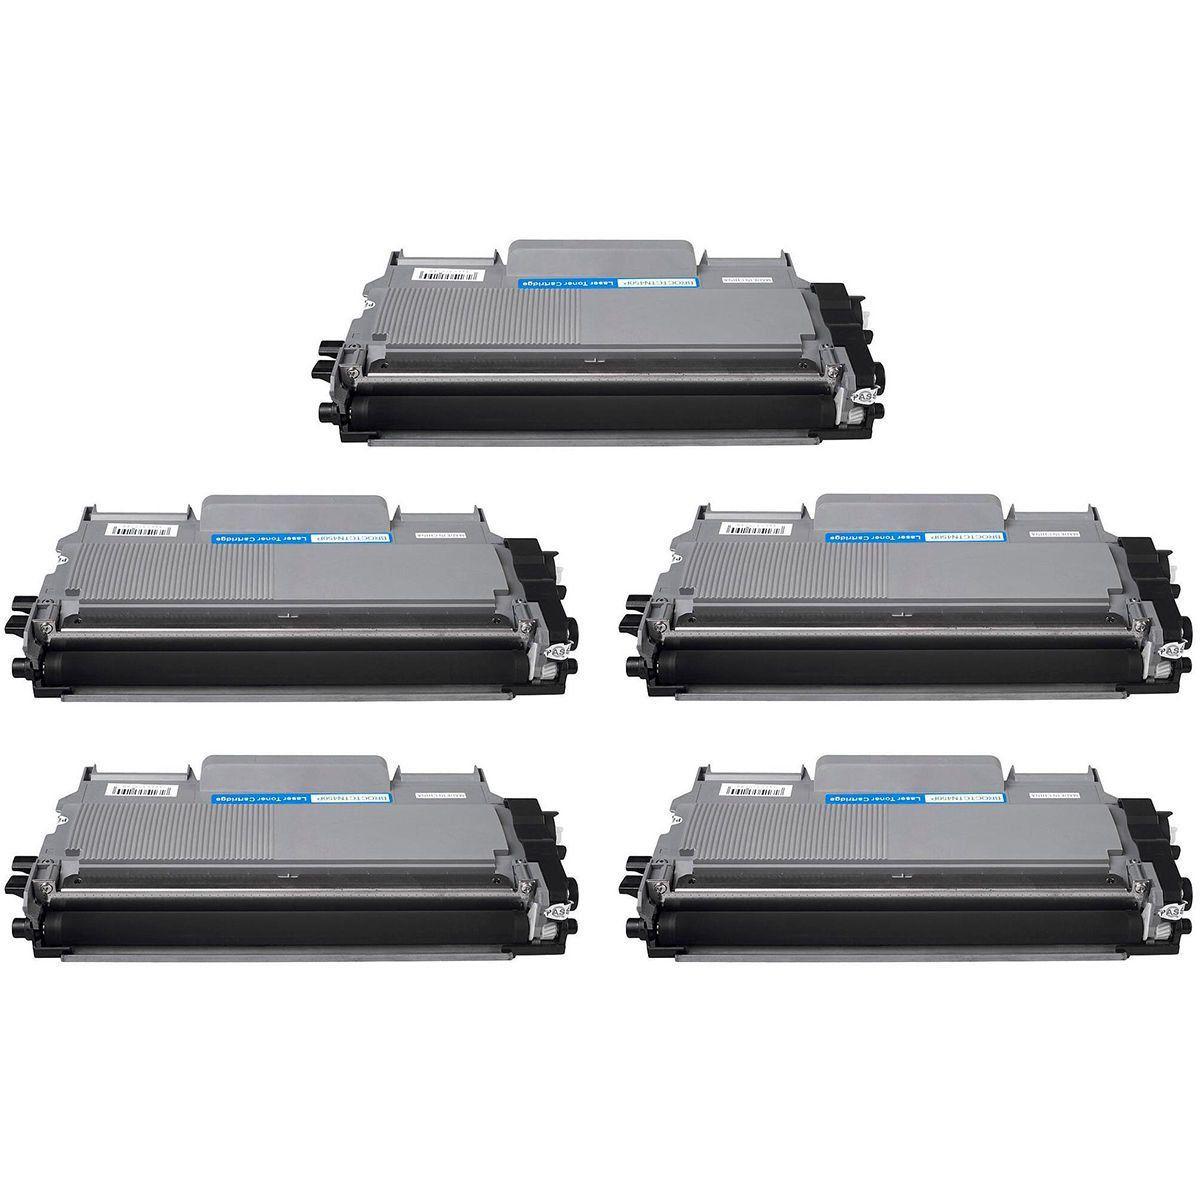 Compatível: Kit 5x Toner TN-410 TN-420 TN-450 para Brother DCP7055 DCP7060 DCP7065 7065dn 7460dn HL5350 / Preto / 2.600